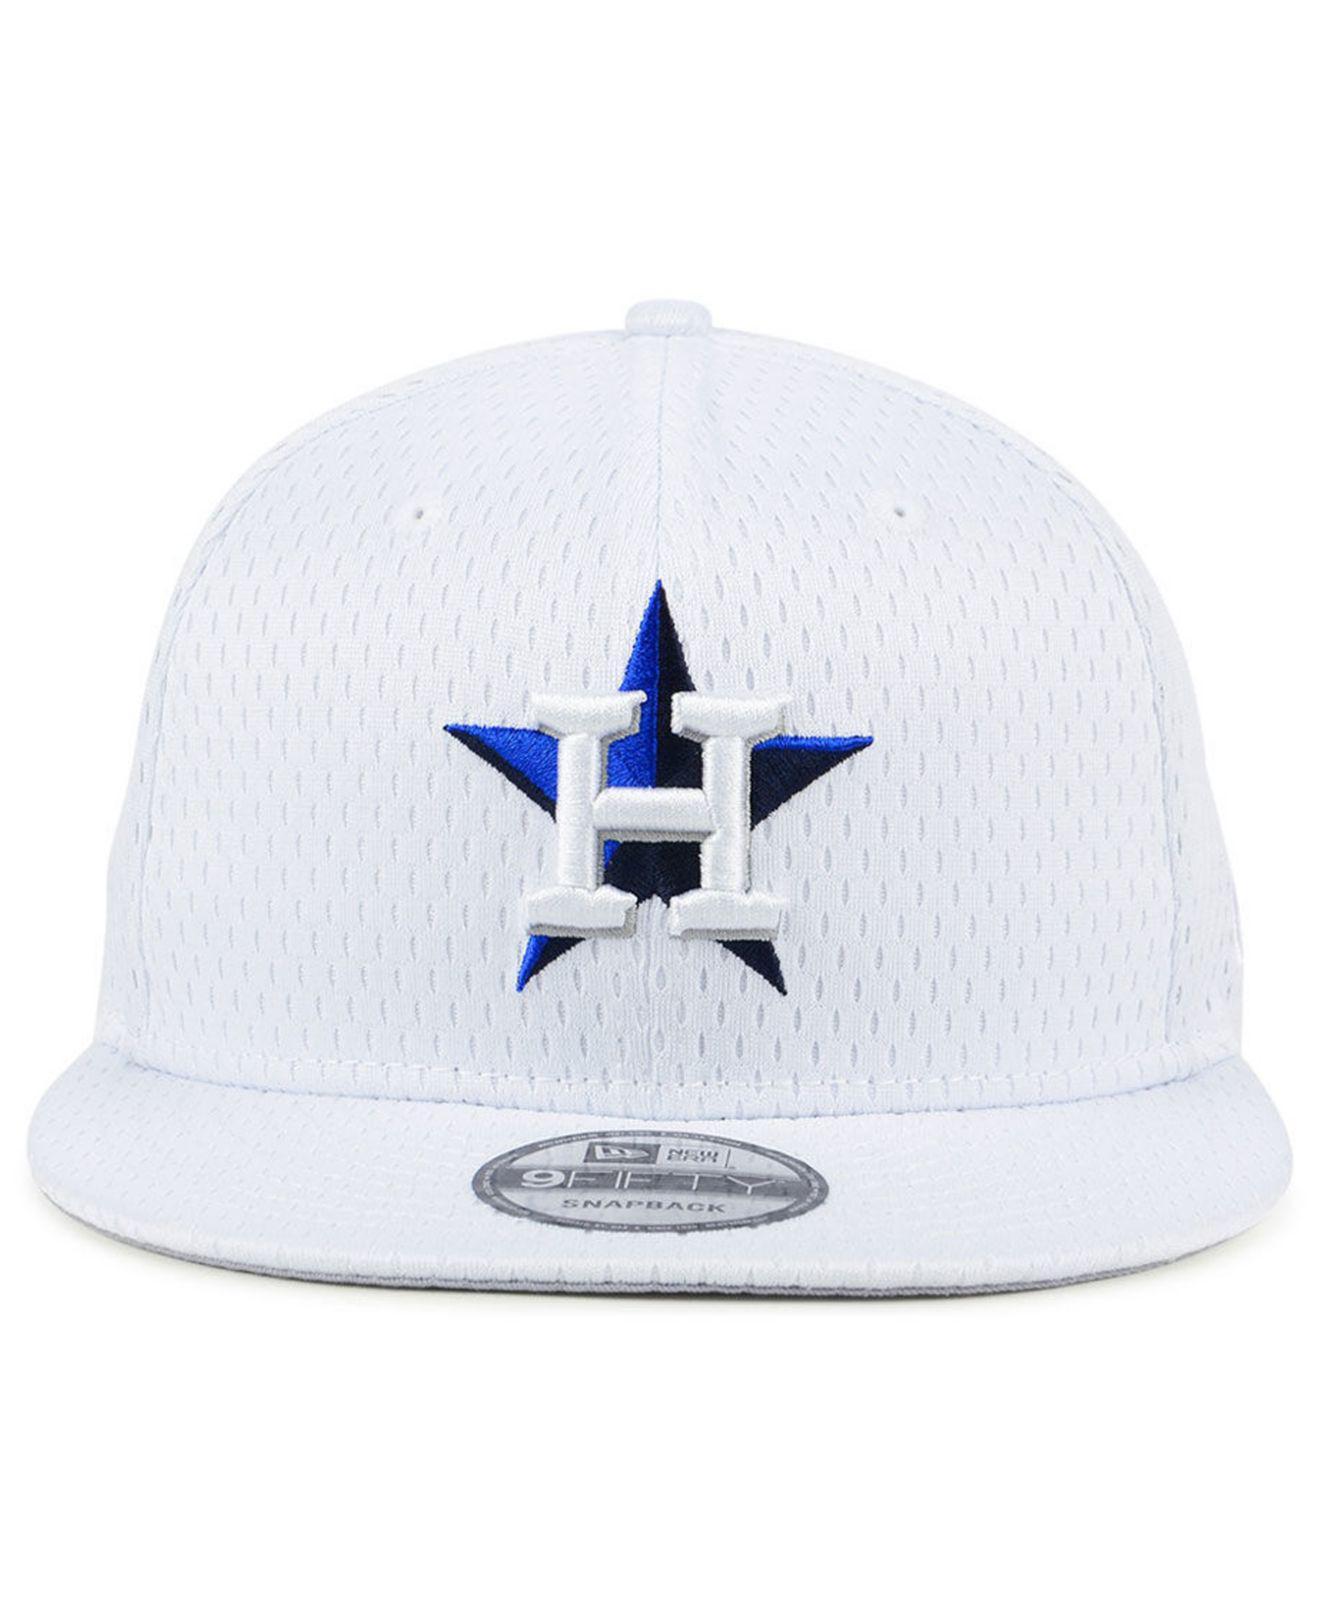 sports shoes f125d 0e89d Lyst - KTZ Houston Astros Batting Practice Mesh 9fifty Snapback Cap in White  for Men